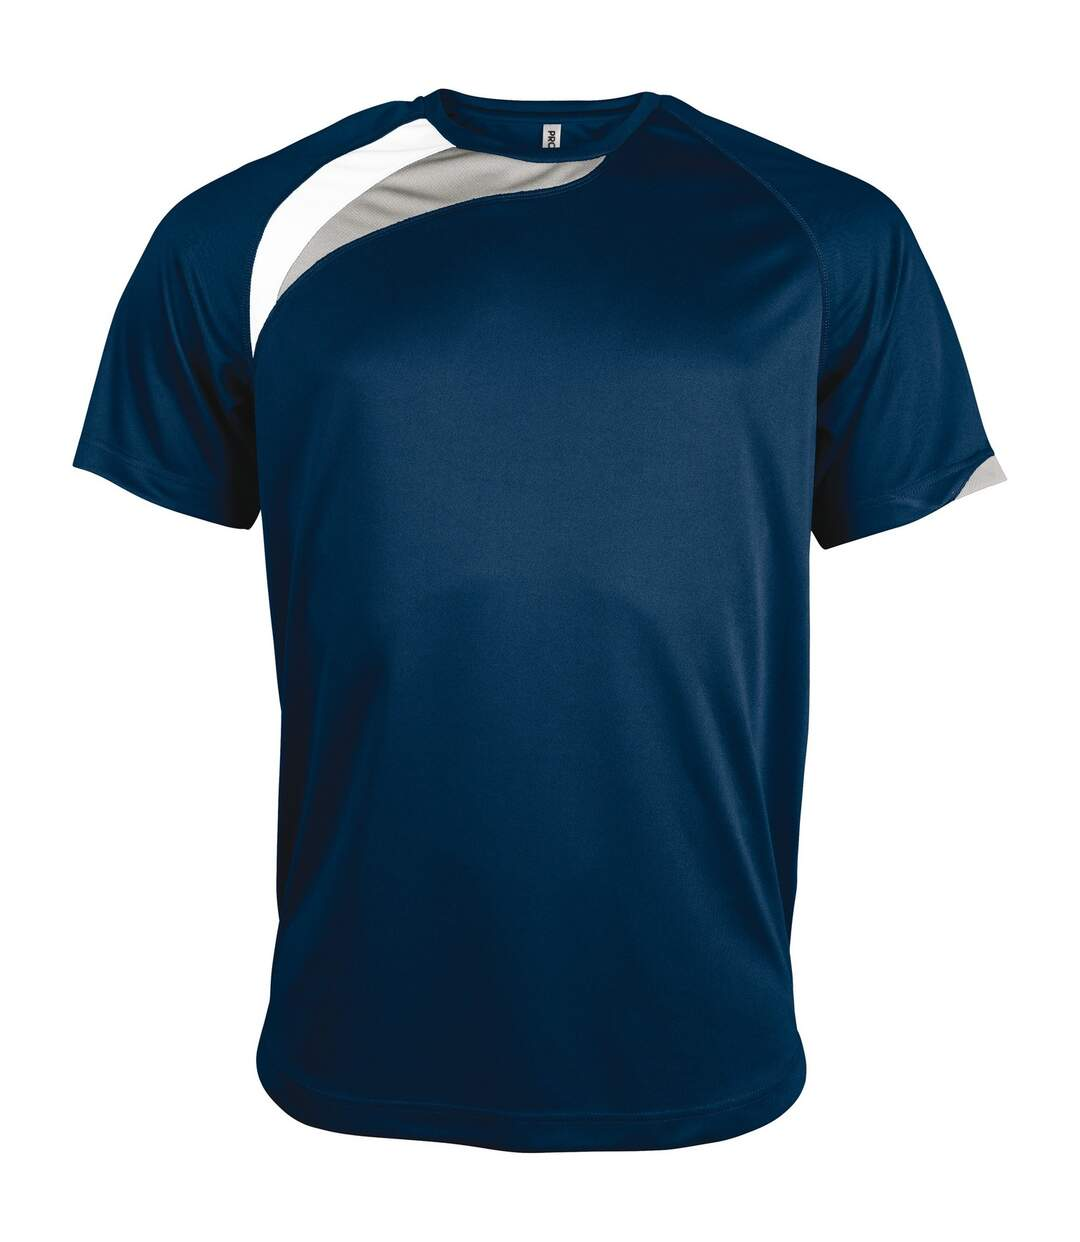 Kariban Proact Mens Short Sleeve Crew Neck Sports T-Shirt (Red/ Black/ Storm Grey) - UTRW4243